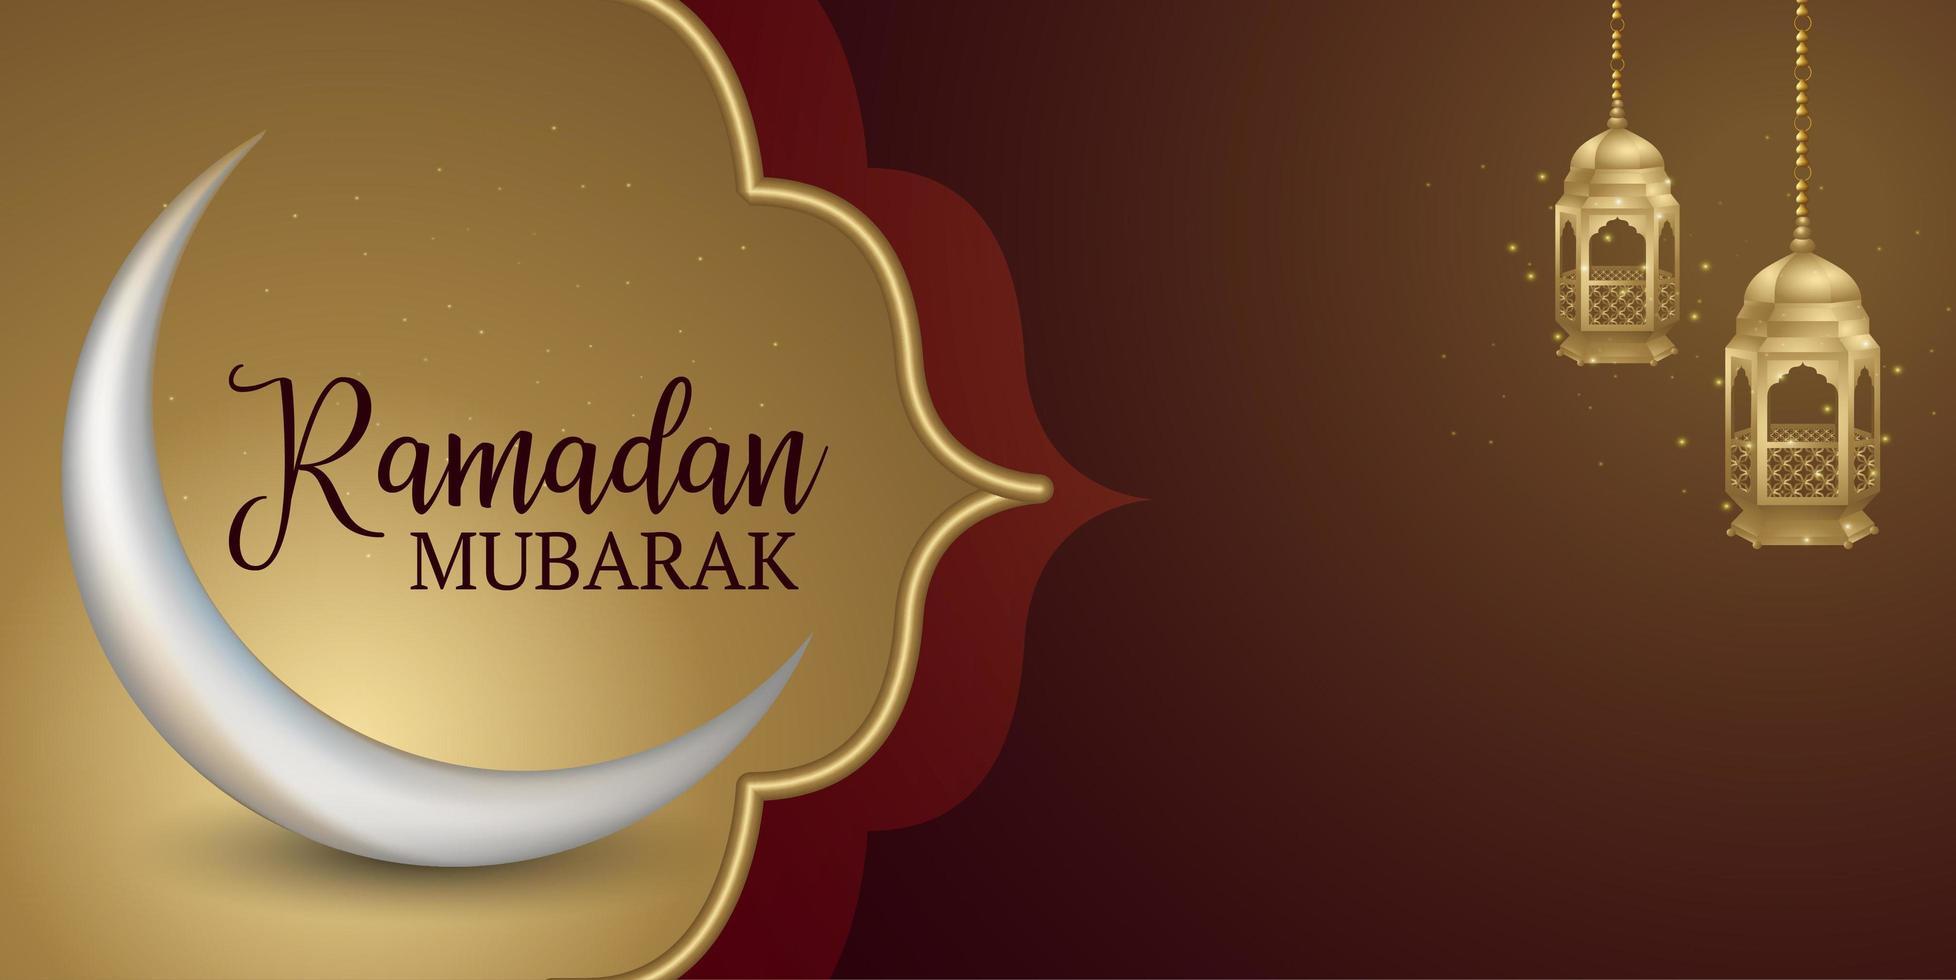 moldura de ouro ramadan kareem e lanternas brilhantes banner vetor